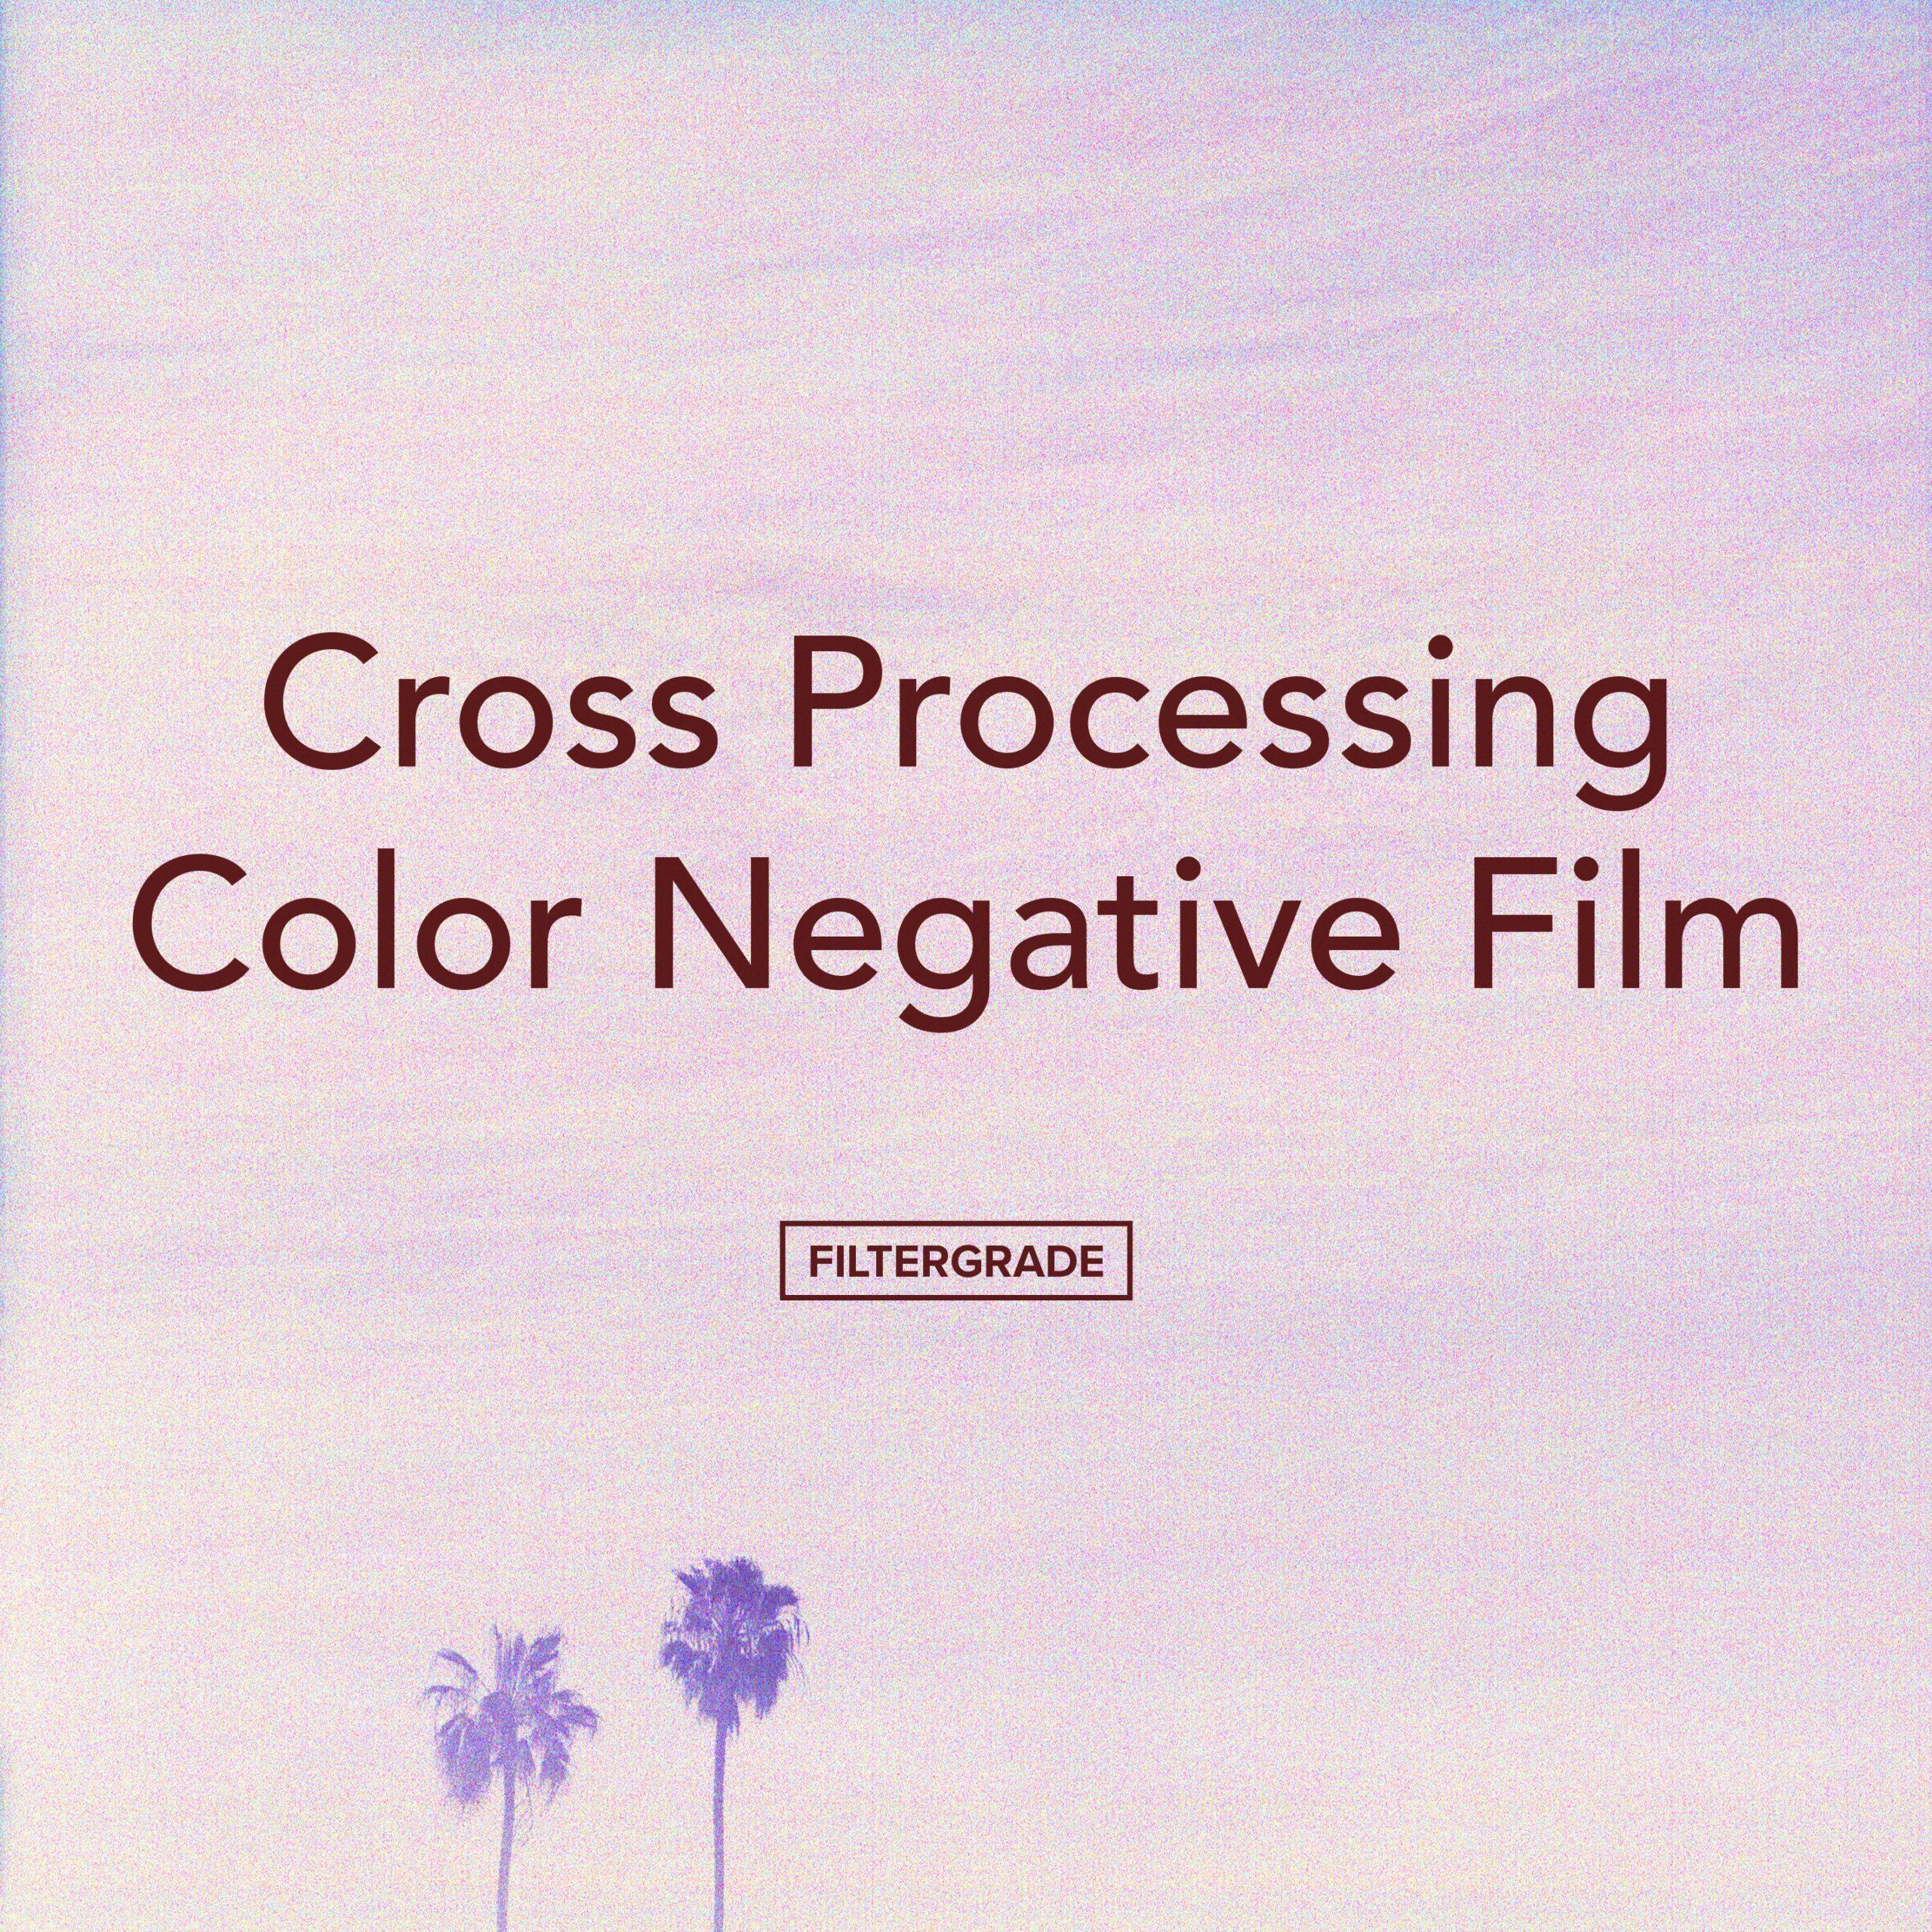 Cross Processing Color Negative Film - FilterGrade